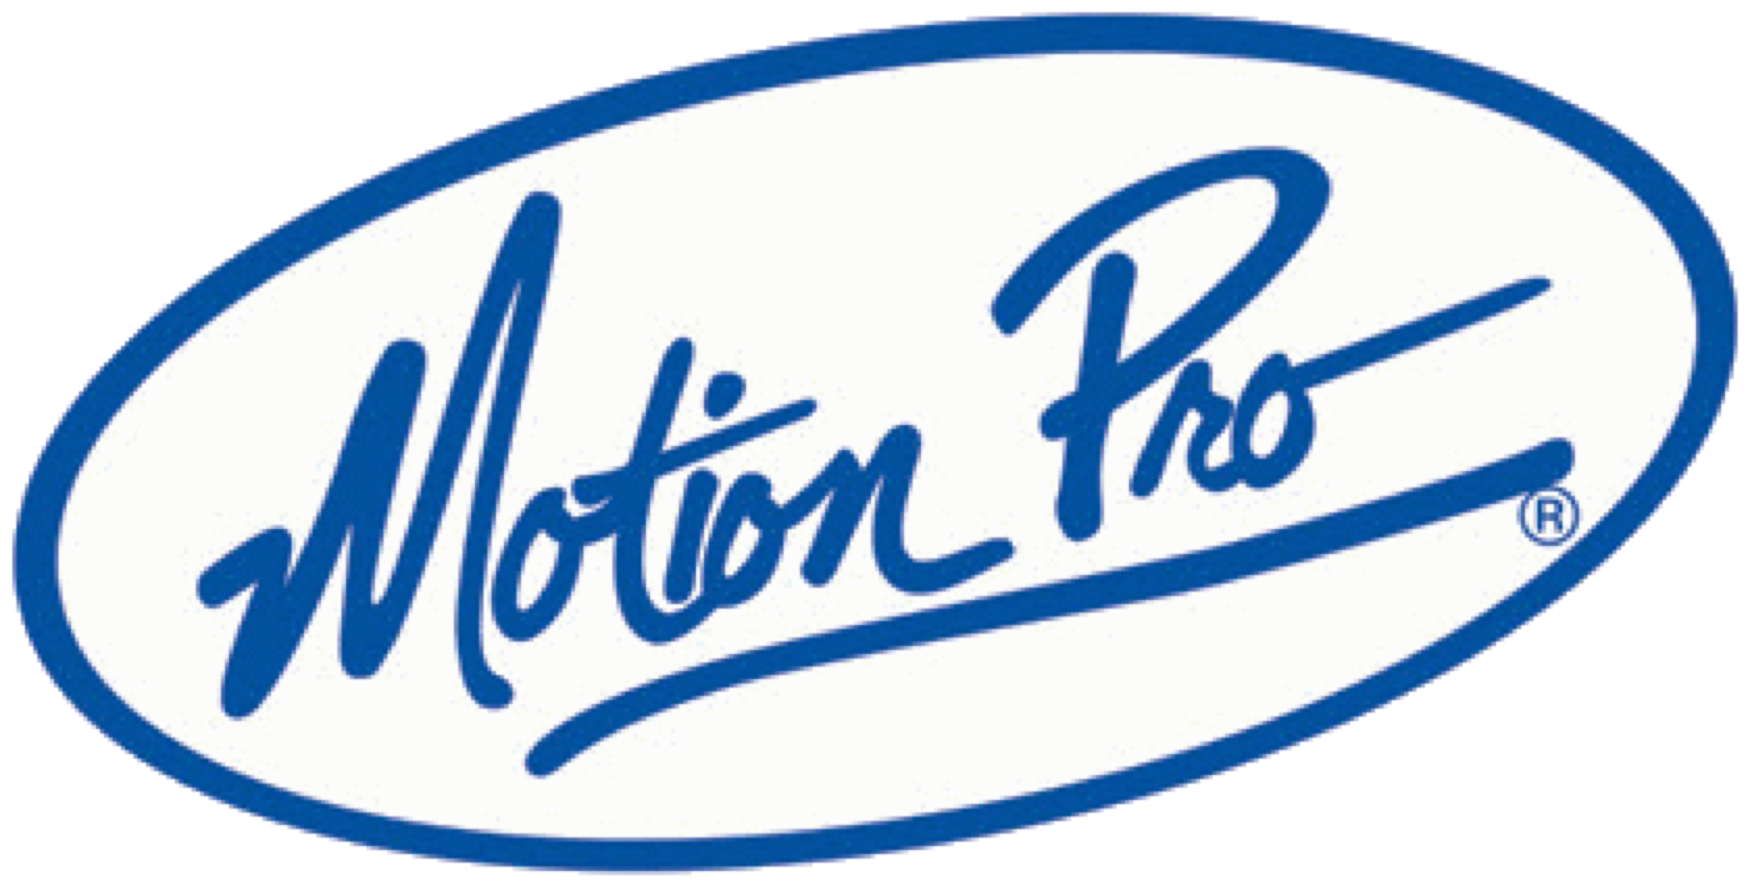 Motion-Pro-Logo cut out.png